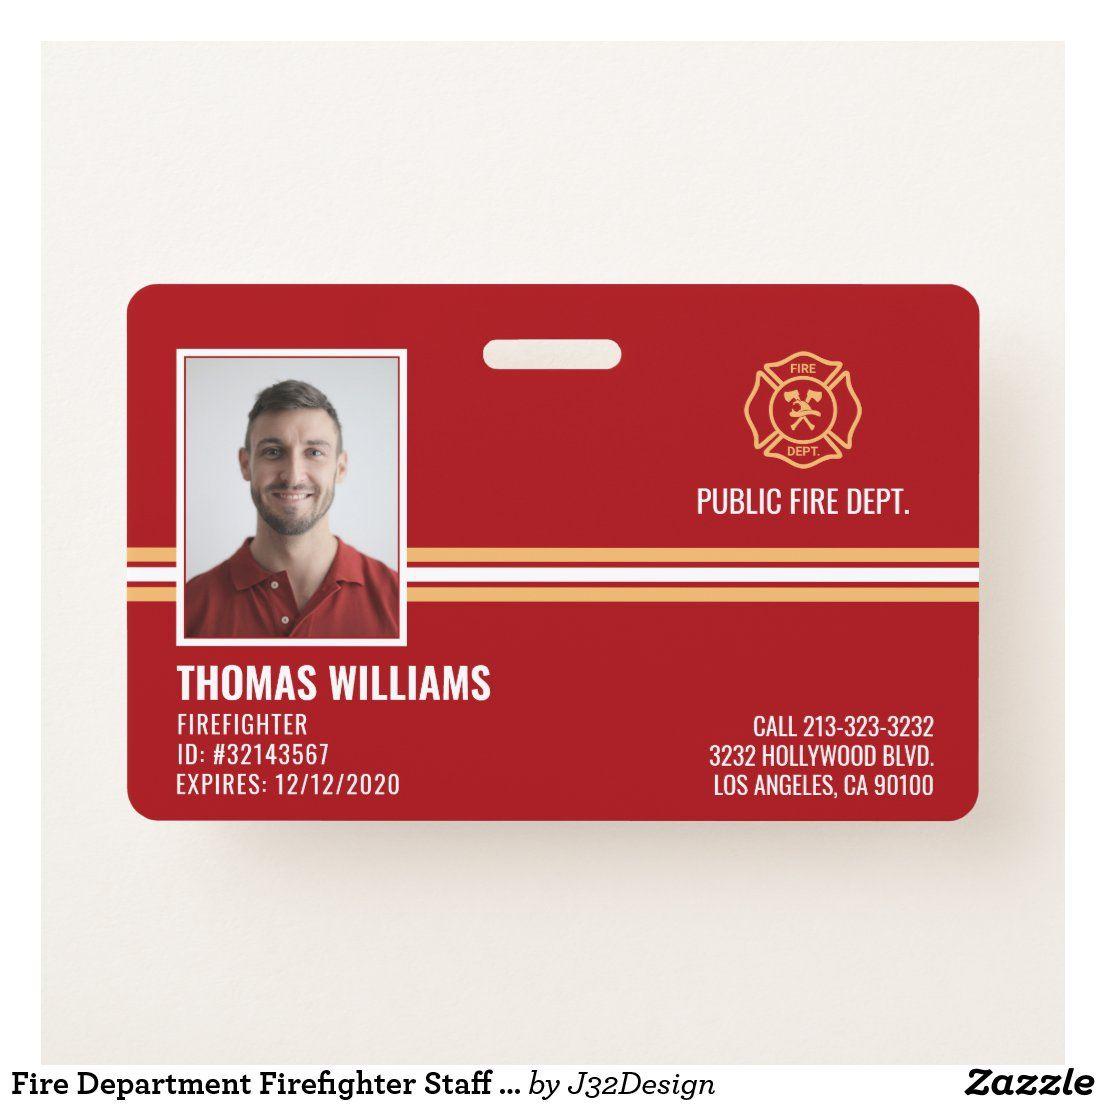 Fire Department Firefighter Staff Id Badge Zazzle Com Fire Department Firefighter Volunteer Fireman